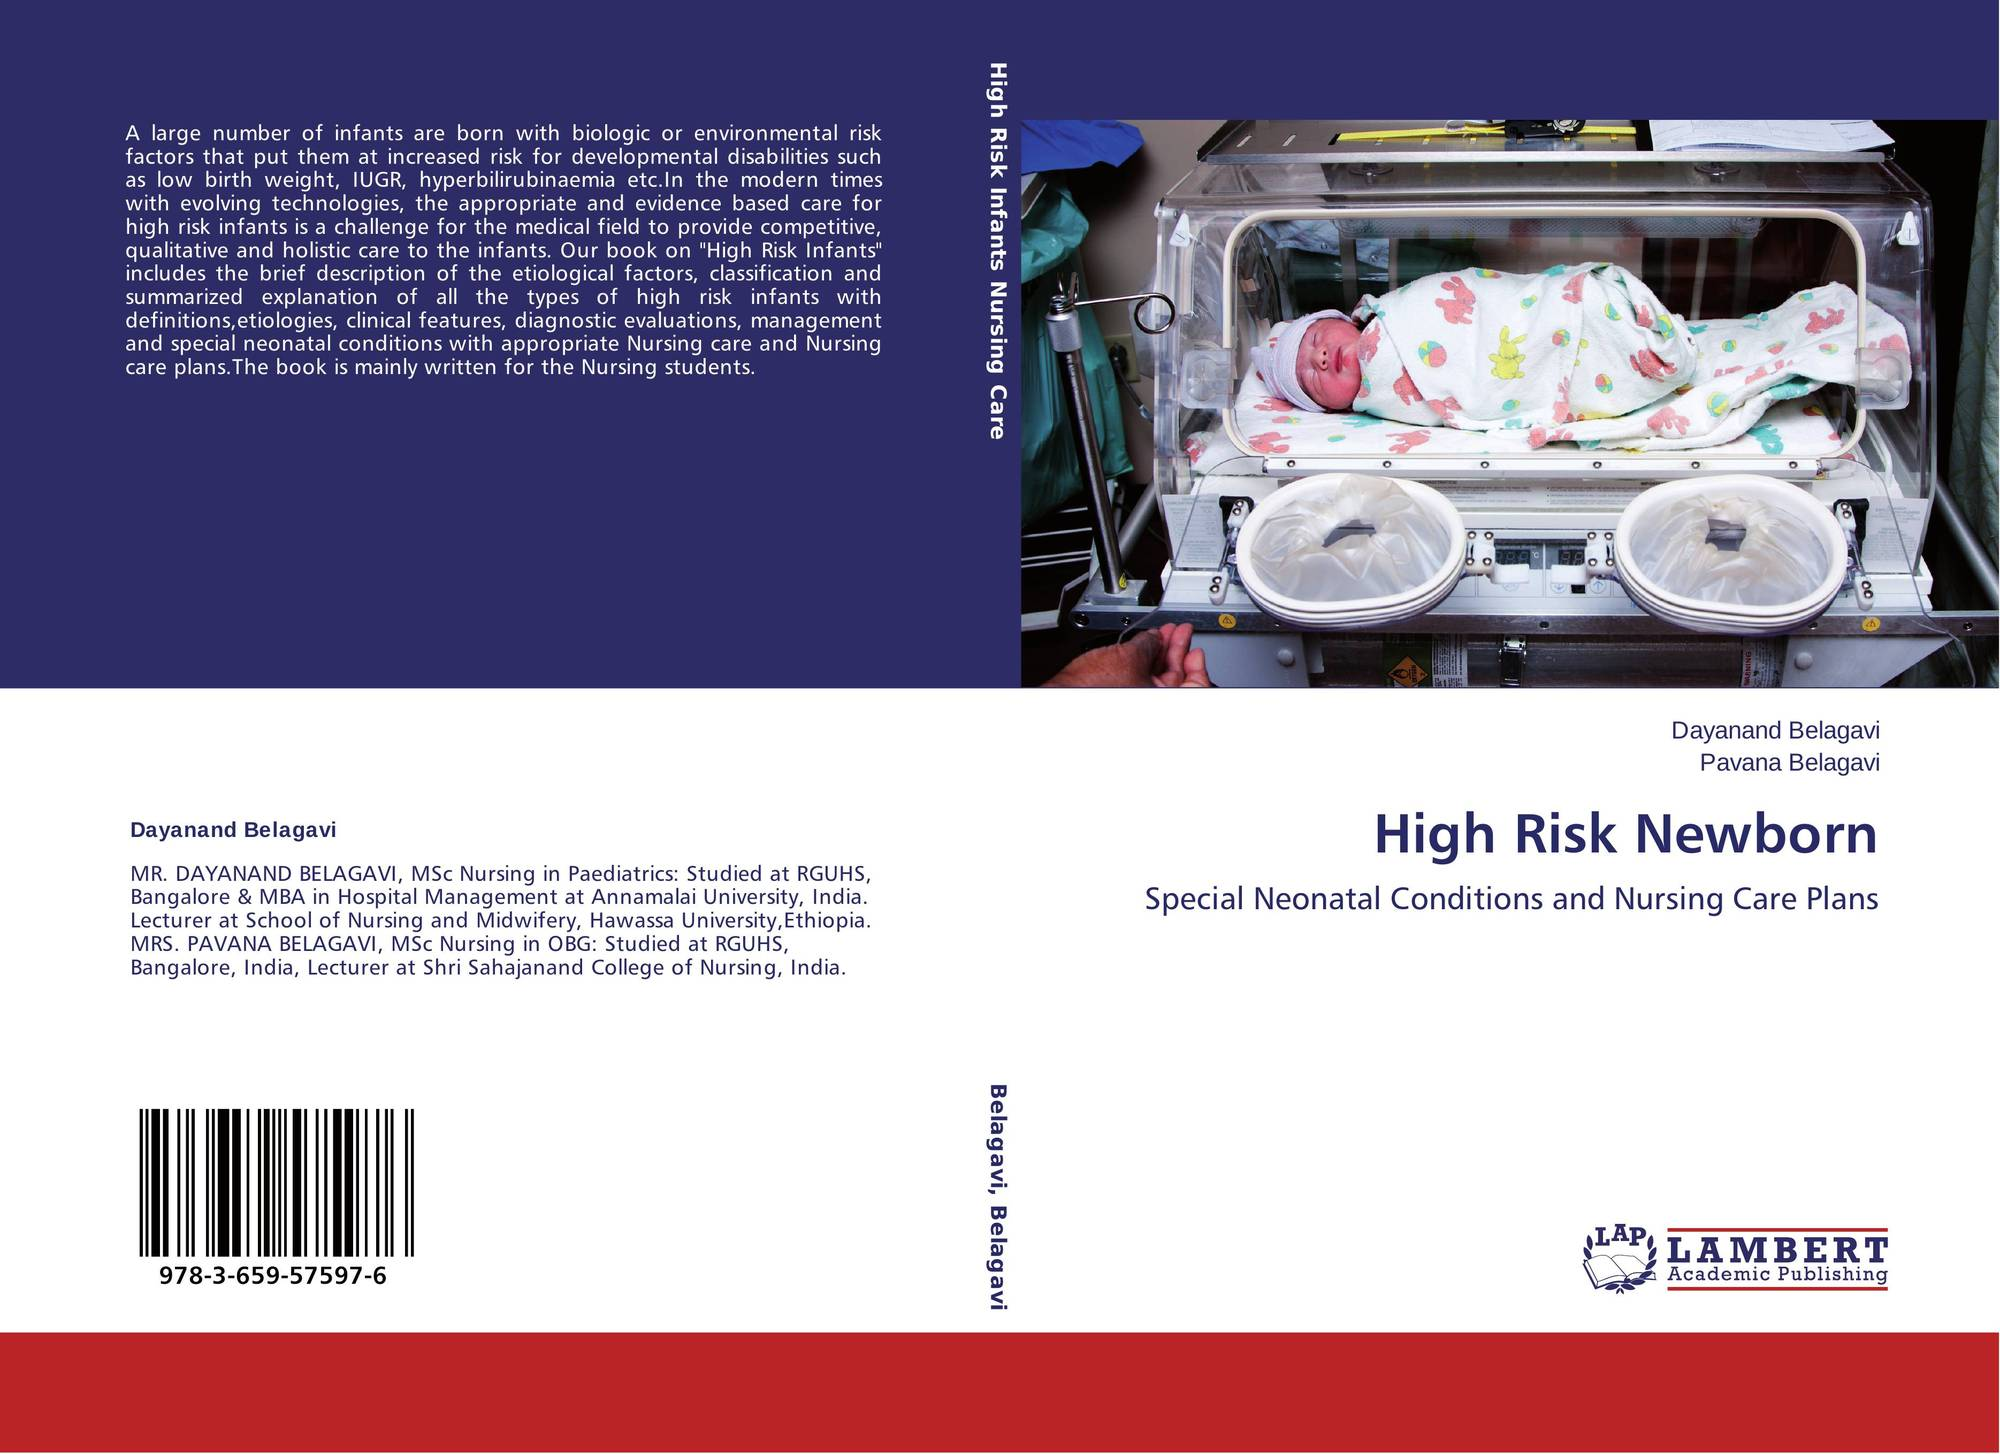 High Risk Newborn, 978-3-659-57597-6, 3659575976 ,9783659575976 by